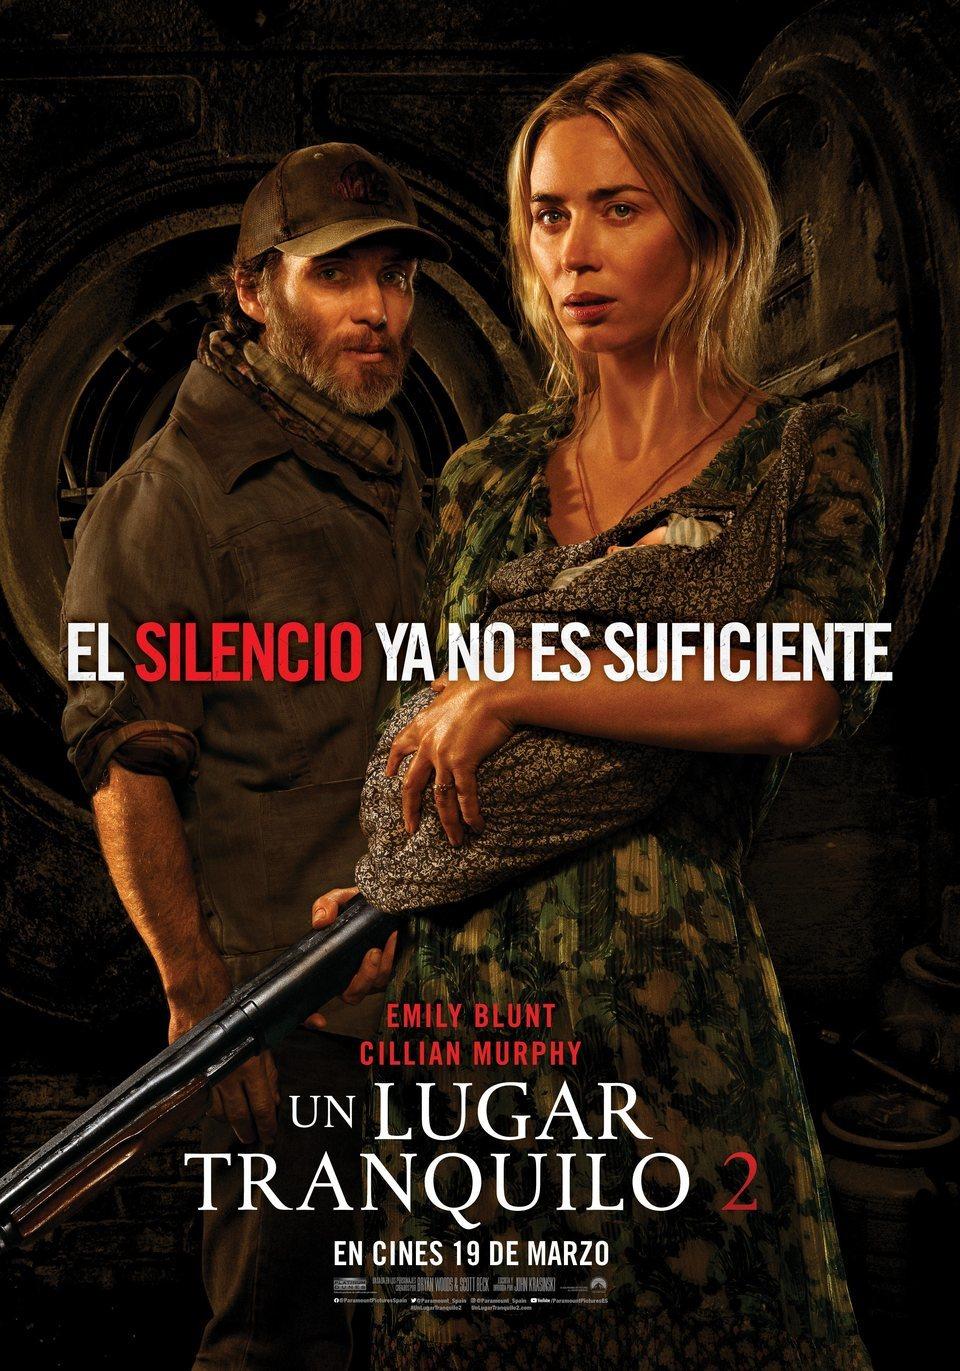 Cinema: Un lugar tranquilo 2 / 05-09-2021, a les 18 h, a l'Hospitalet de l'Infant